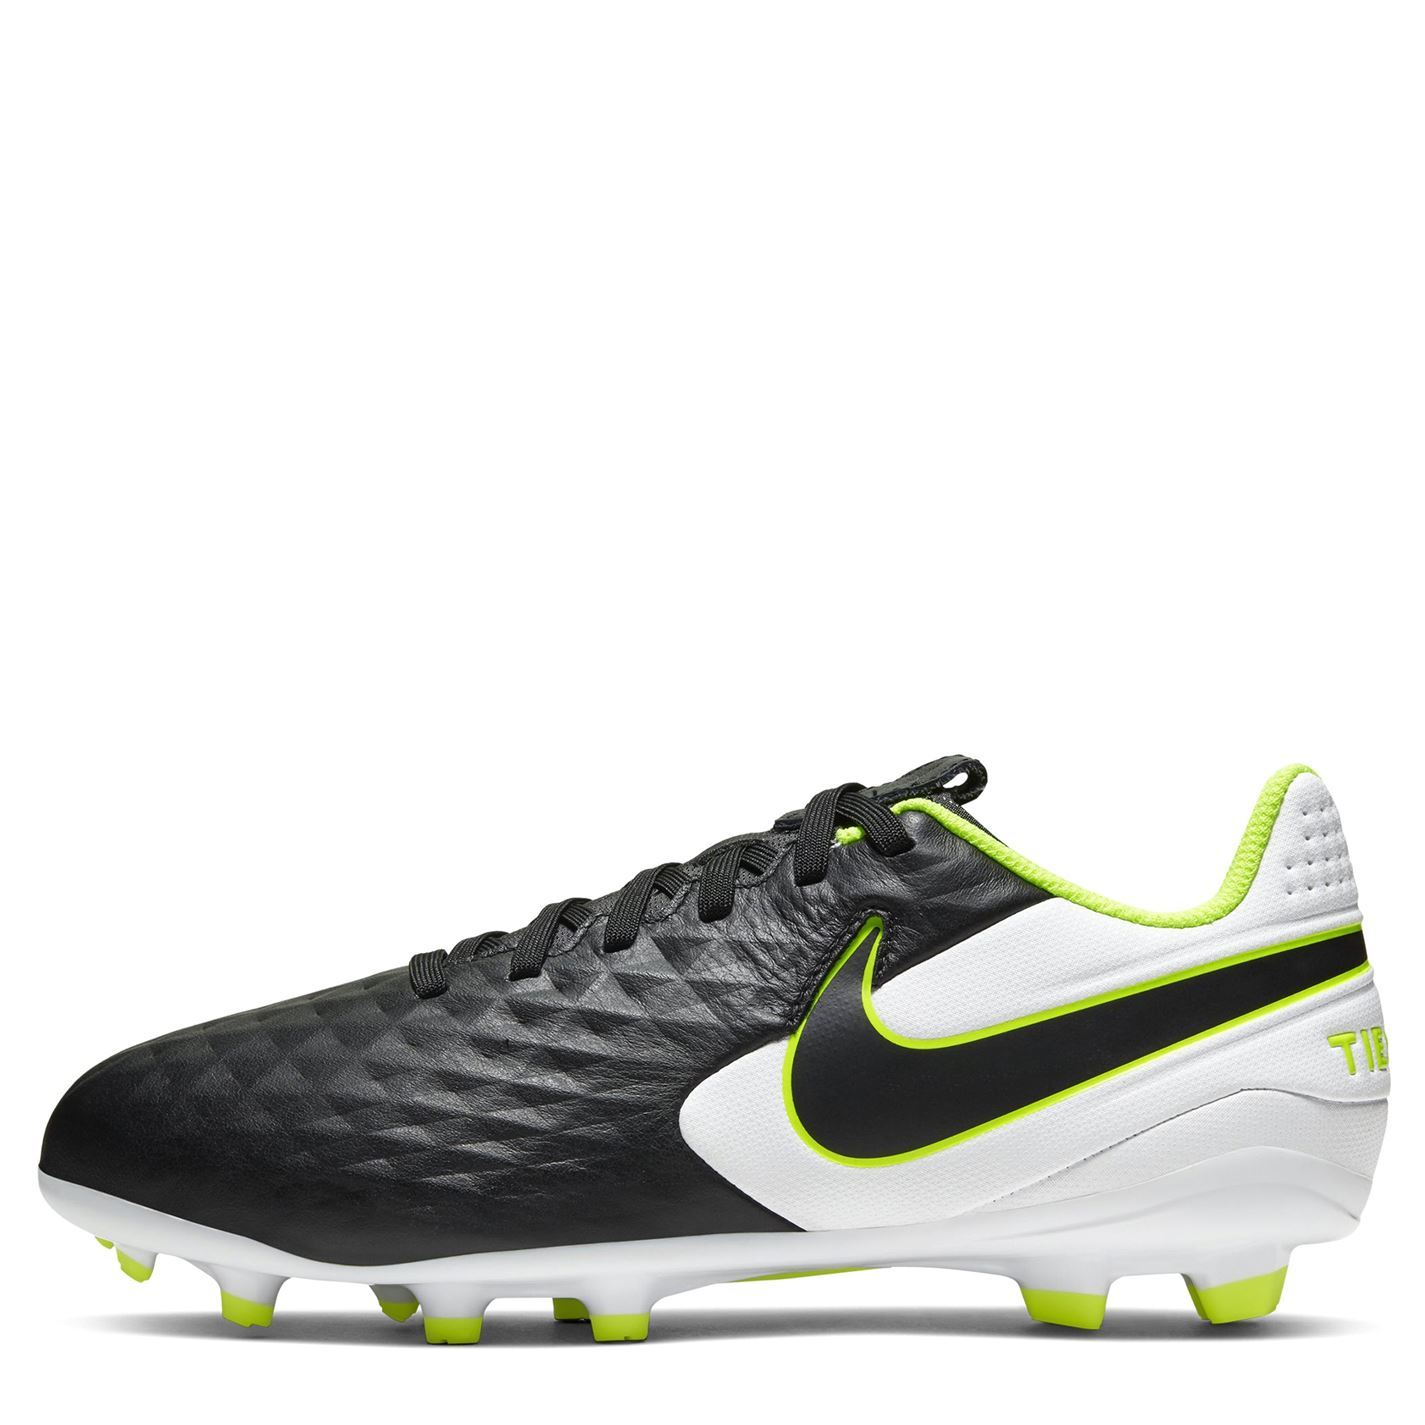 miniature 15 - Nike-Tiempo-Legend-Academy-Junior-FG-Firm-Ground-football-boots-Boys-Football